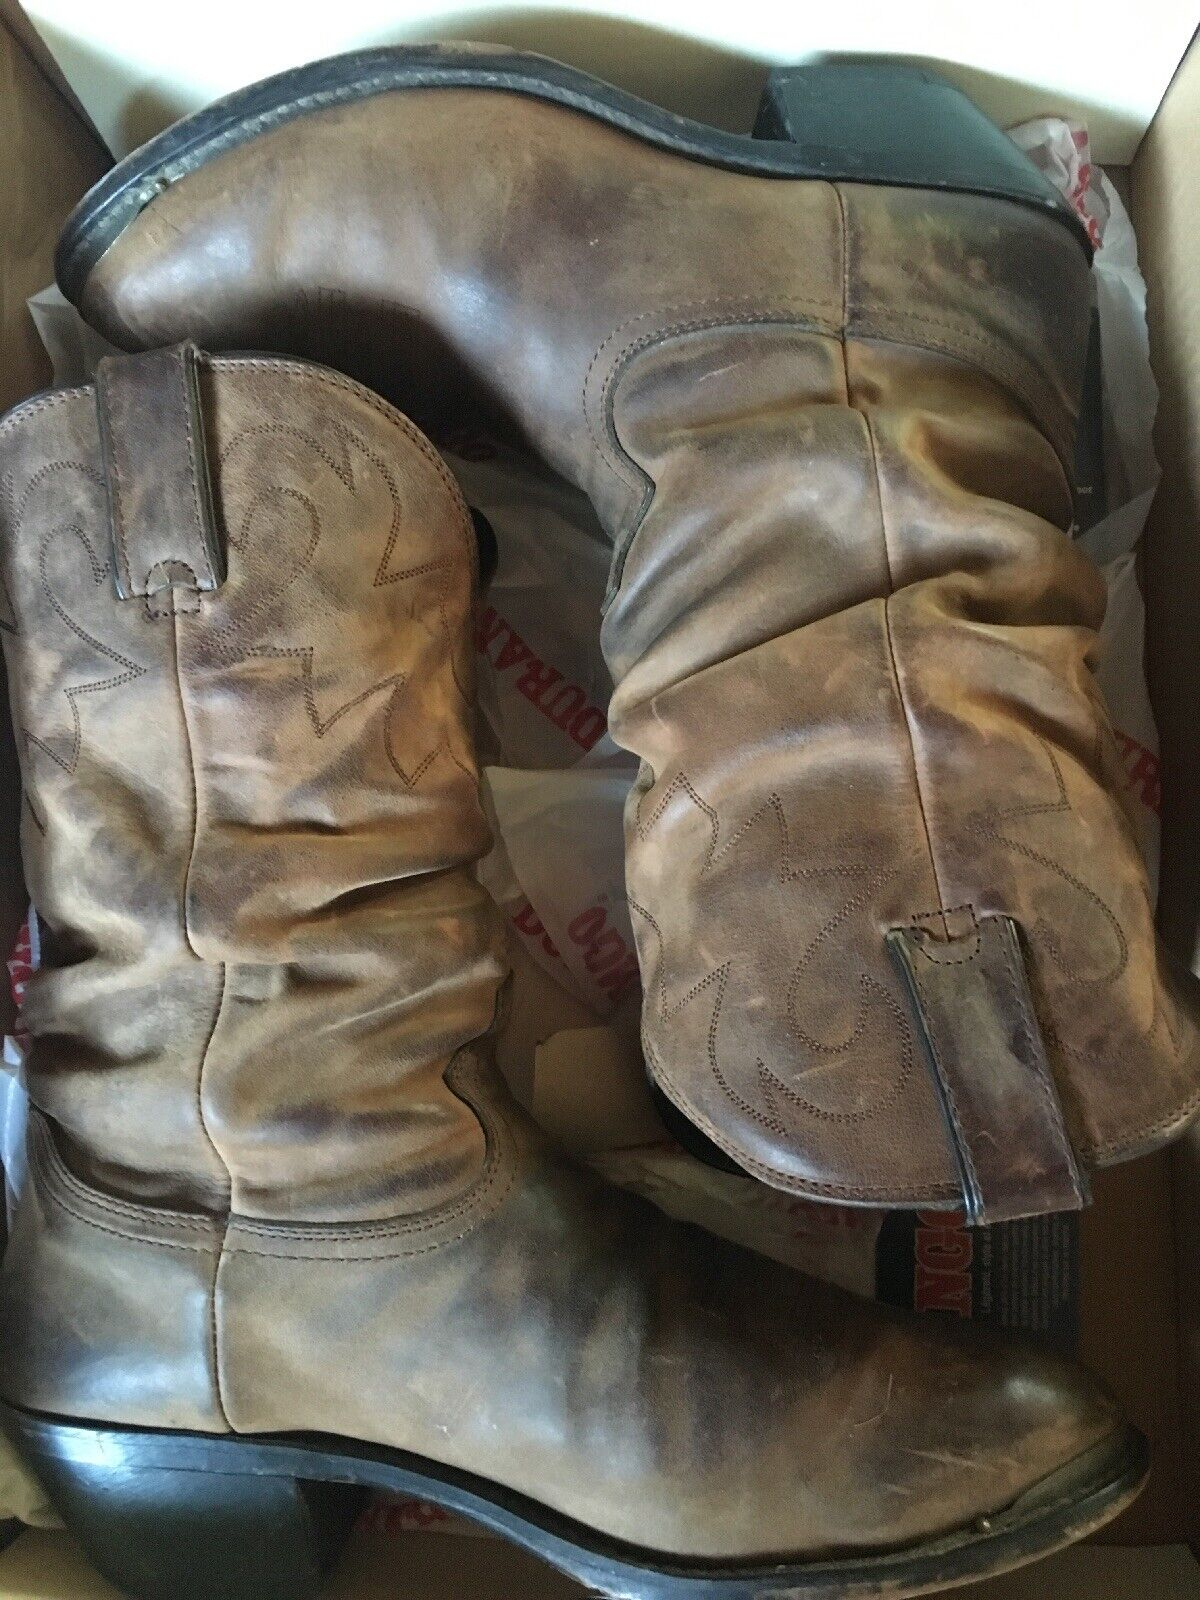 b7cd5c3f506 Durango Crush Slouch Brown Western Cowboy Women's Boots Rd542 Size 10 M